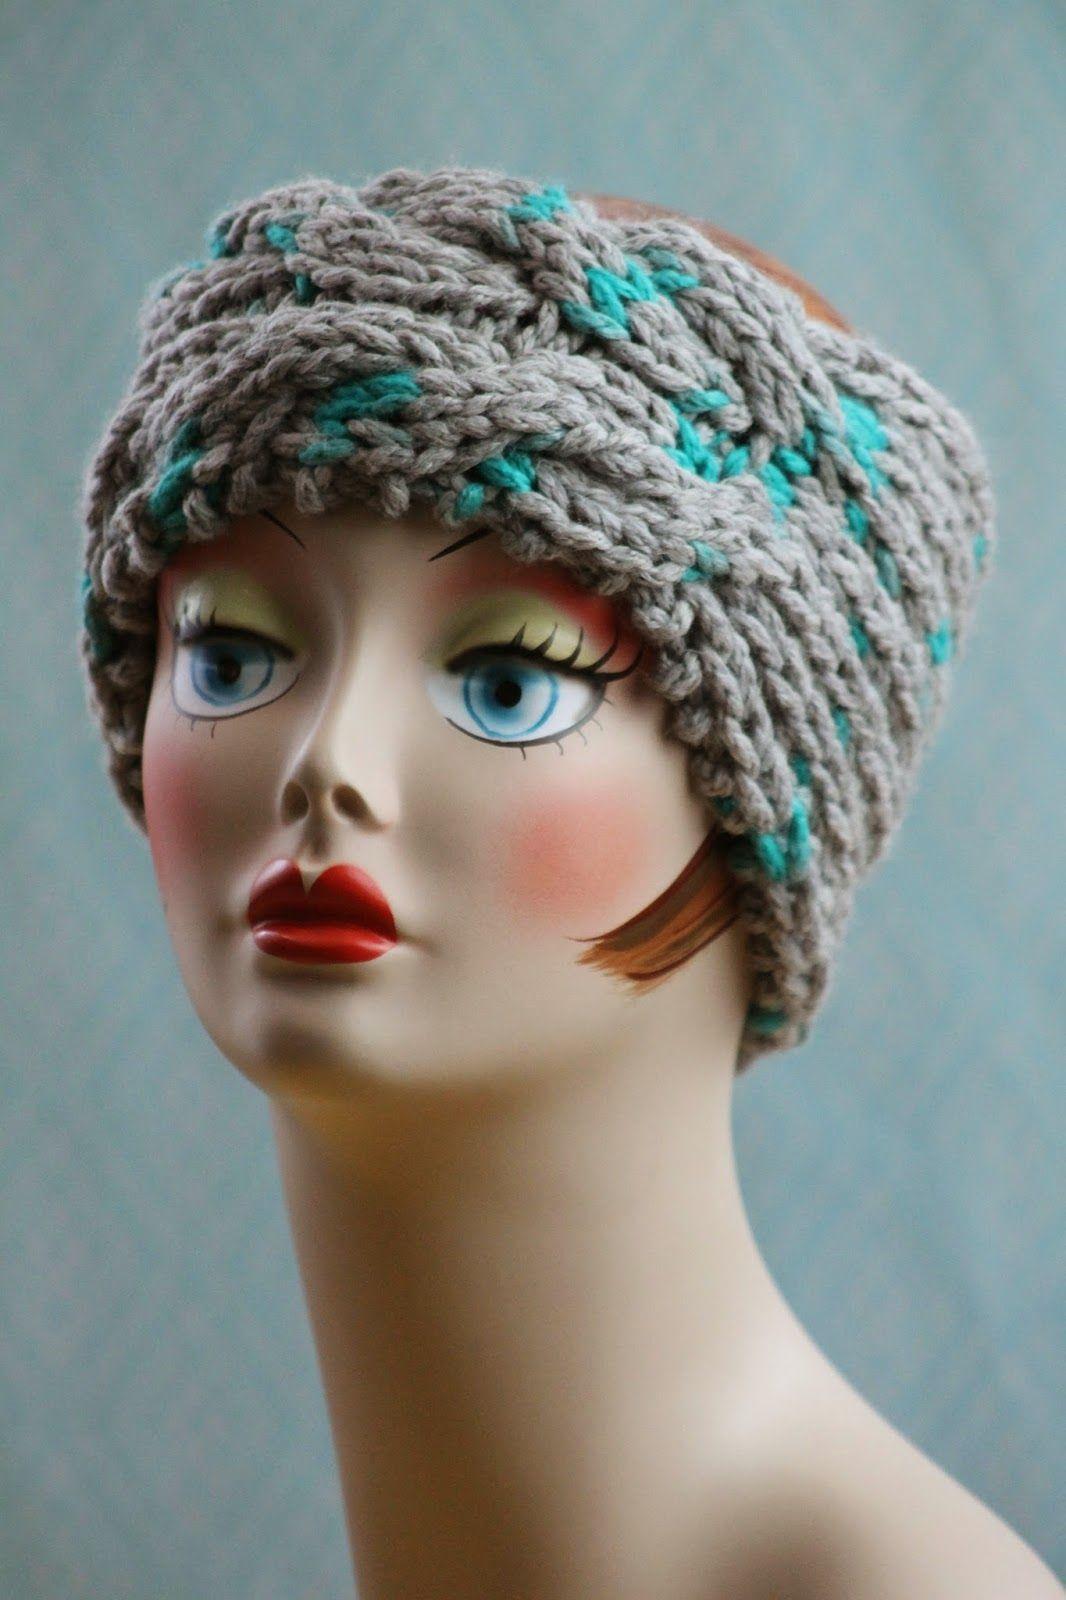 Free pattern blue angel headband balls to the walls knits a free pattern blue angel headband balls to the walls knits a collection of free easy knittingknitting bankloansurffo Images